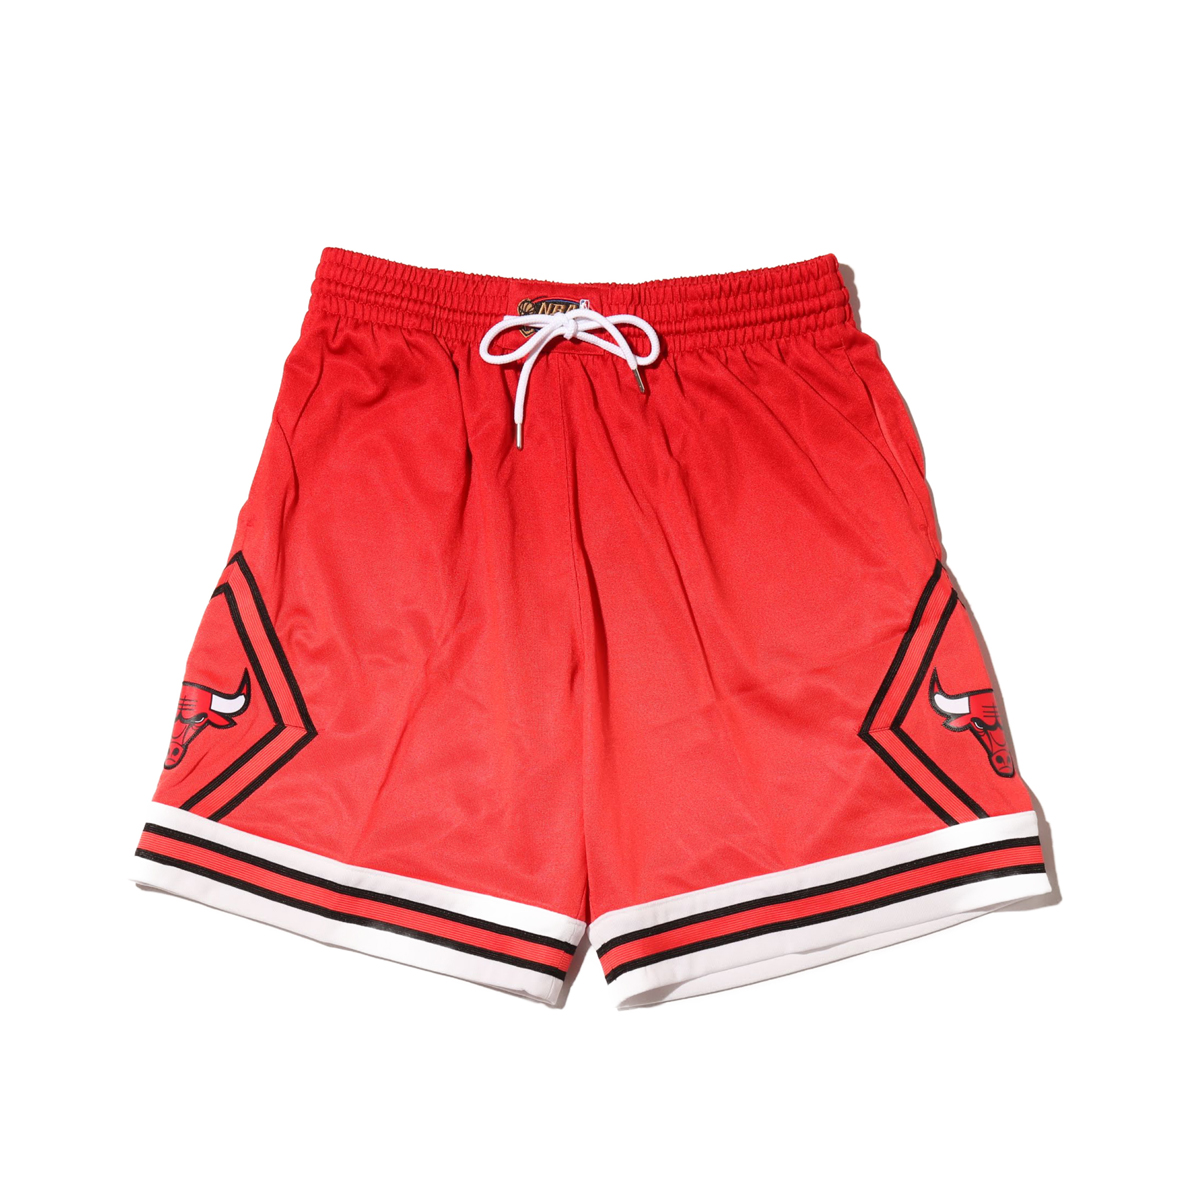 Mitchell & Ness Old English Swingman Shorts C.Bulls(RED)(ミッチェルアンドネス オールドイングリッシュ ショーツ/シカゴブルズ)【メンズ】【ハーフパンツ】【19HO-I】